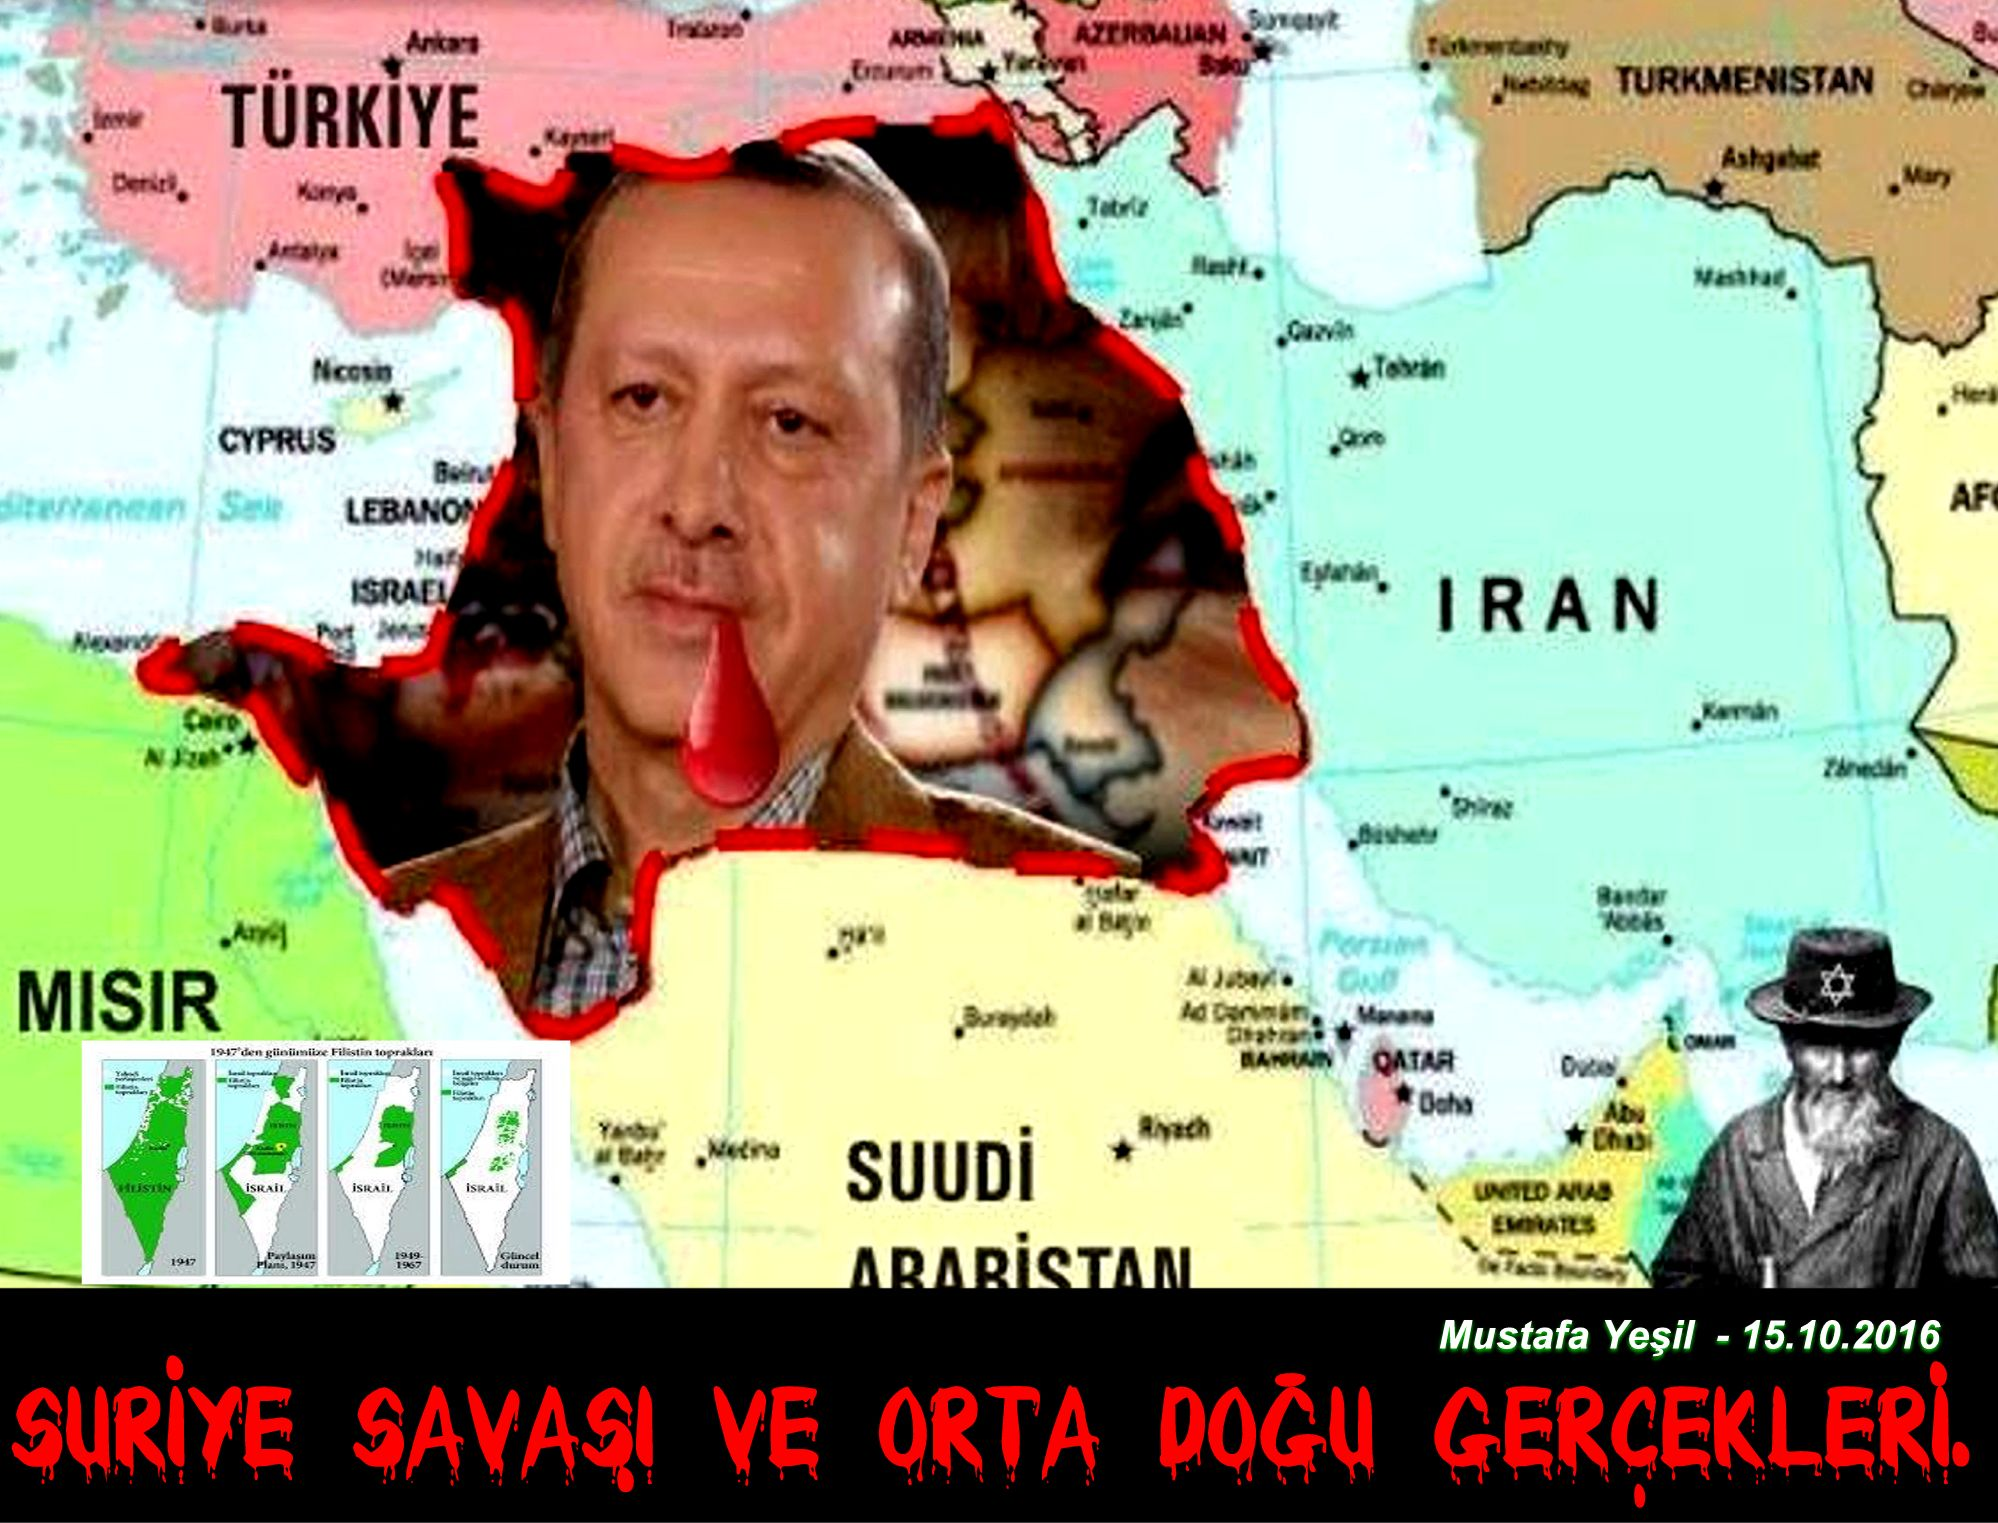 suriye-devrimci-aleviler-birligi-dab-alevi-kizilbas-bektasi-pir-sultan-cemevi